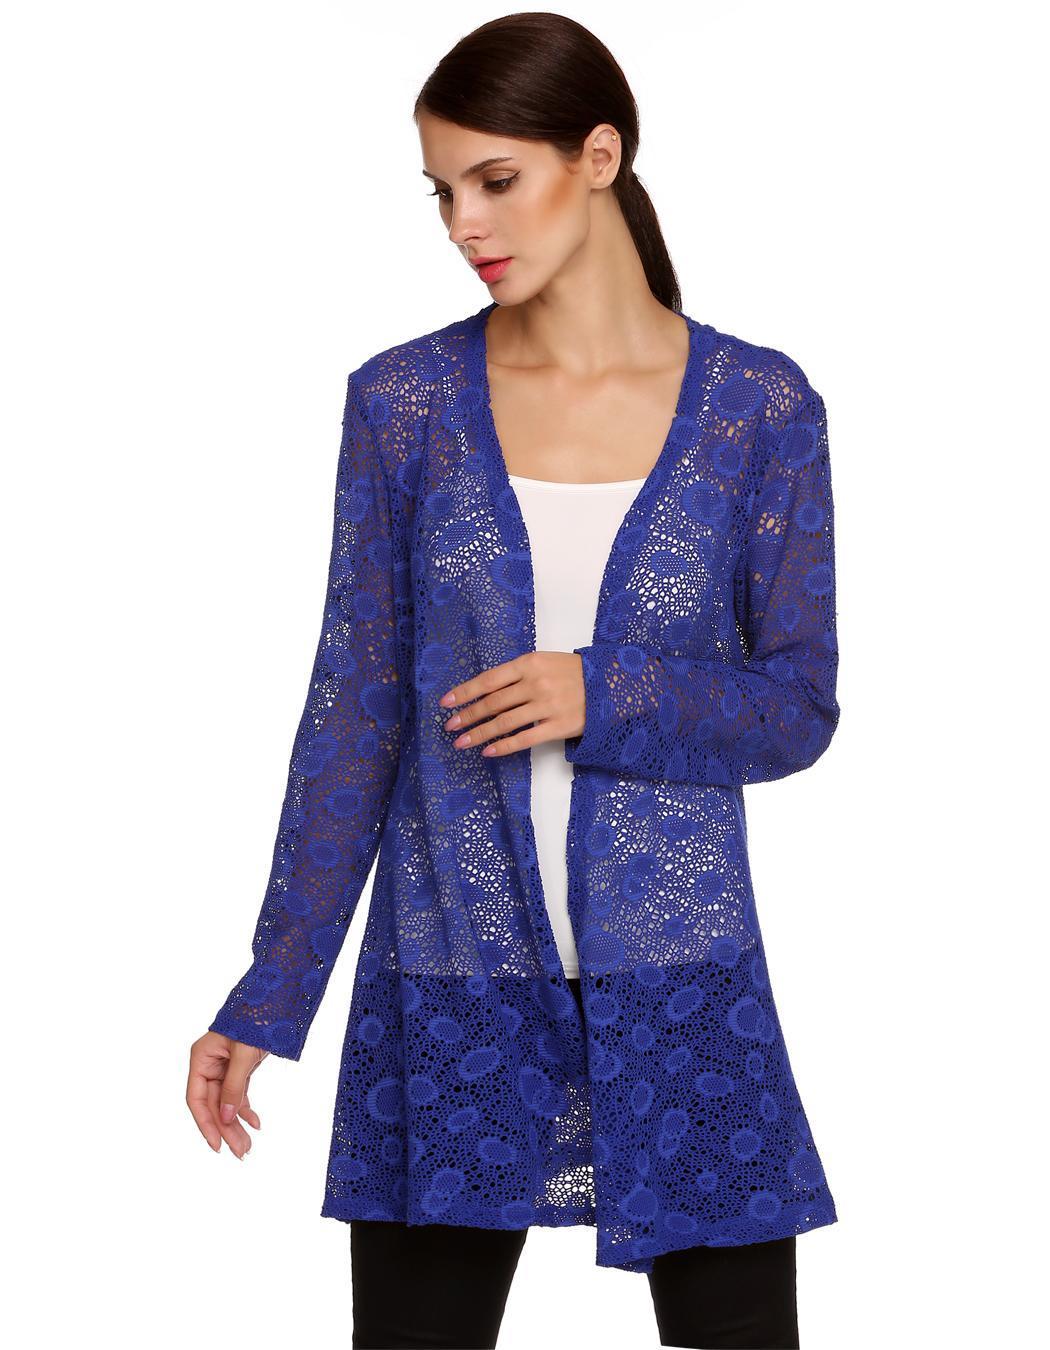 Women Long Sleeve Hollow Out Crochet Long Cardigan Tops 4